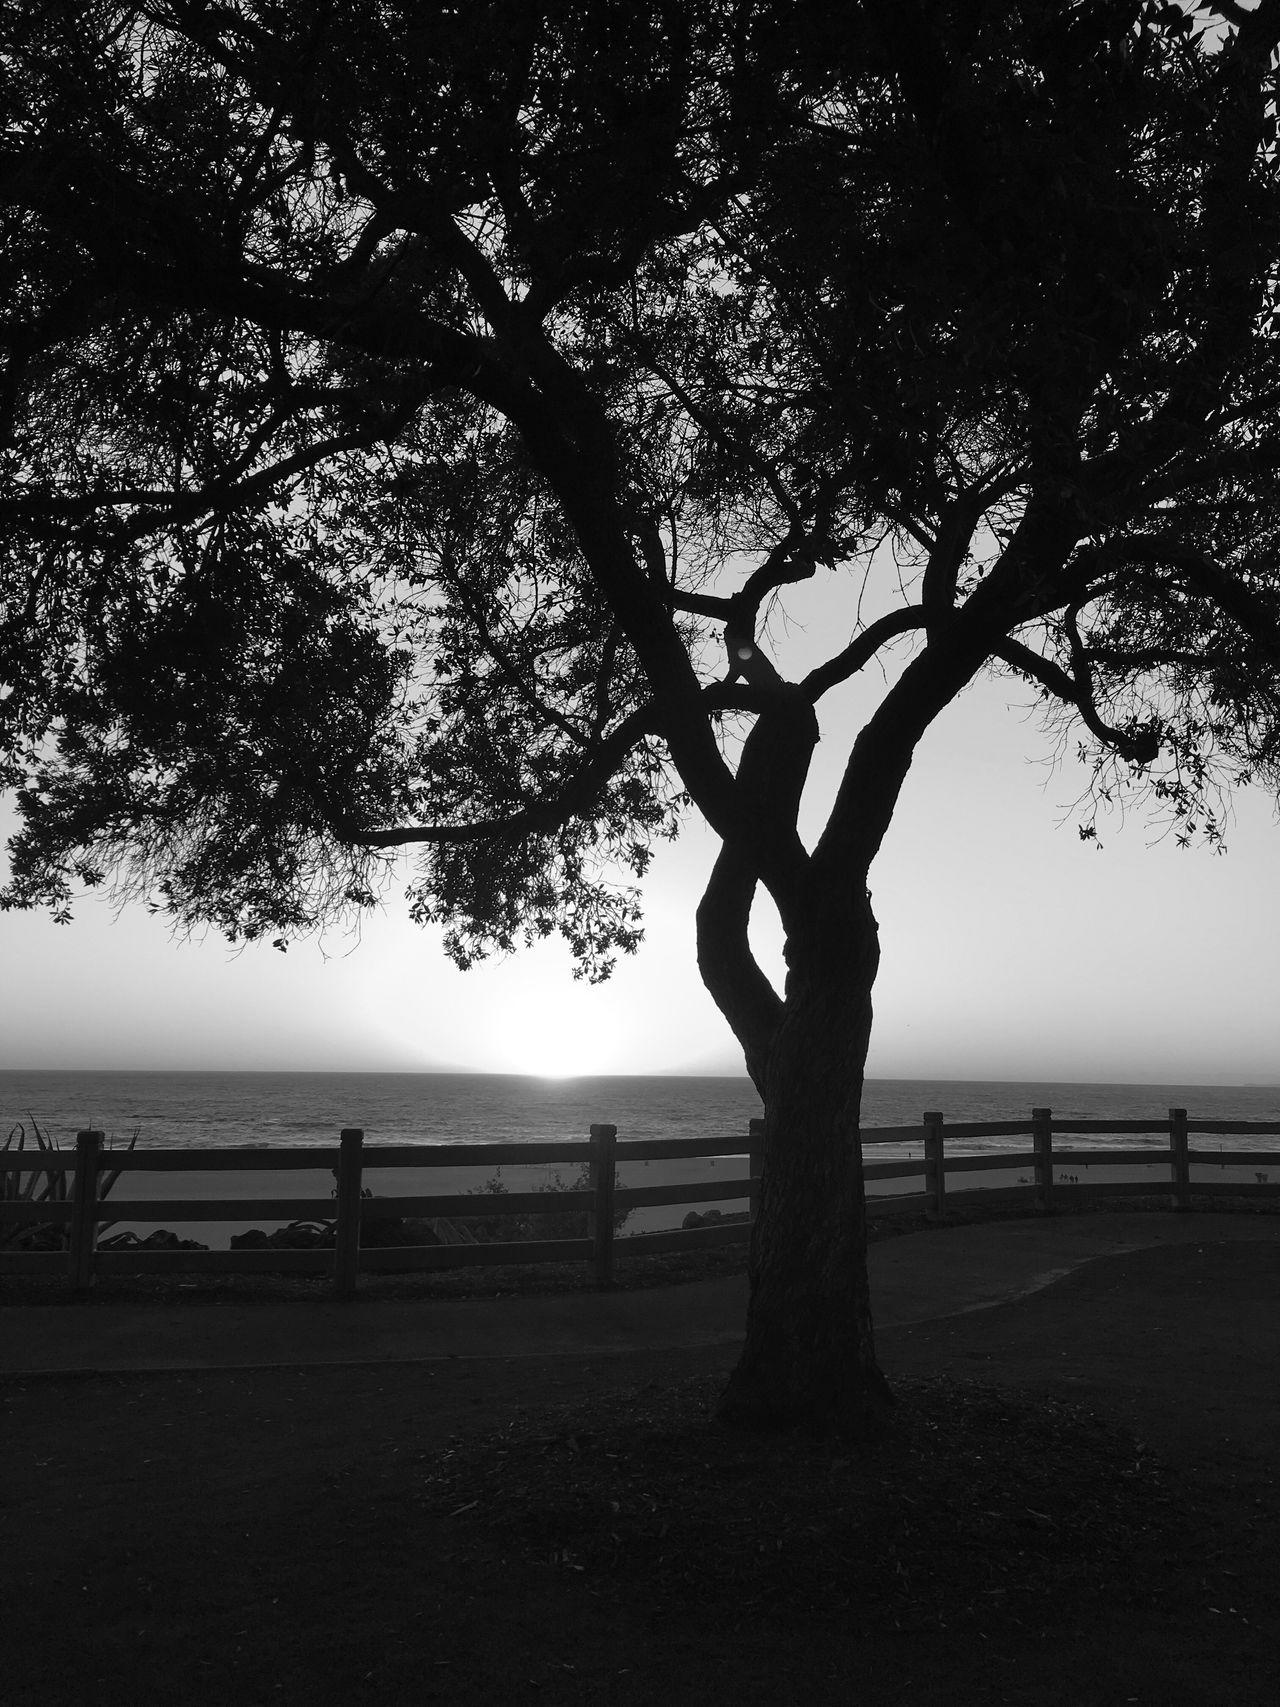 A California Sunset Nature Sunset Santa Monica California EyeEm Best Shots Fine Art Photography Beach Blackandwhite Bw_collection Shootermag Tree